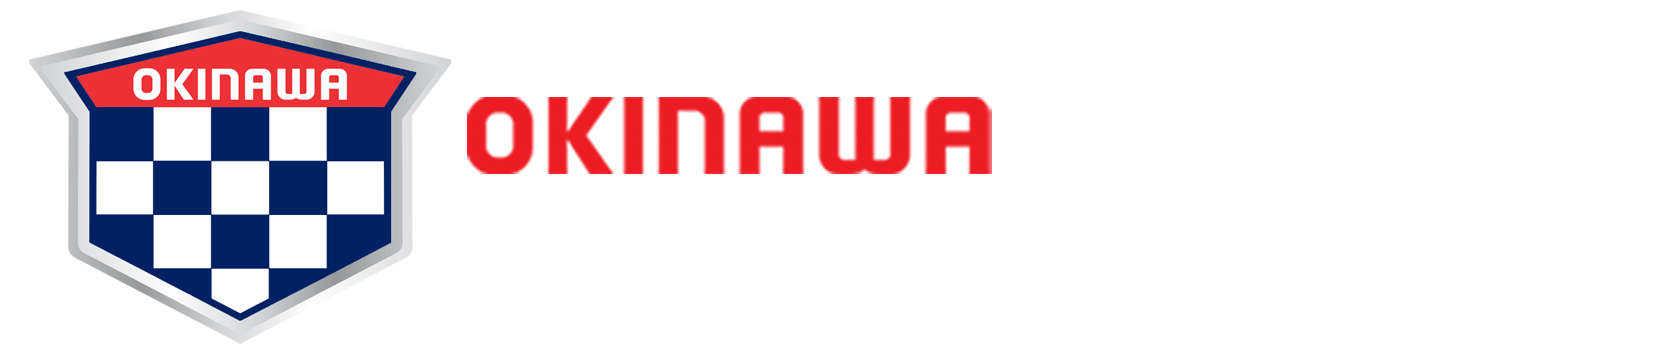 Okinawa Scooter Logo